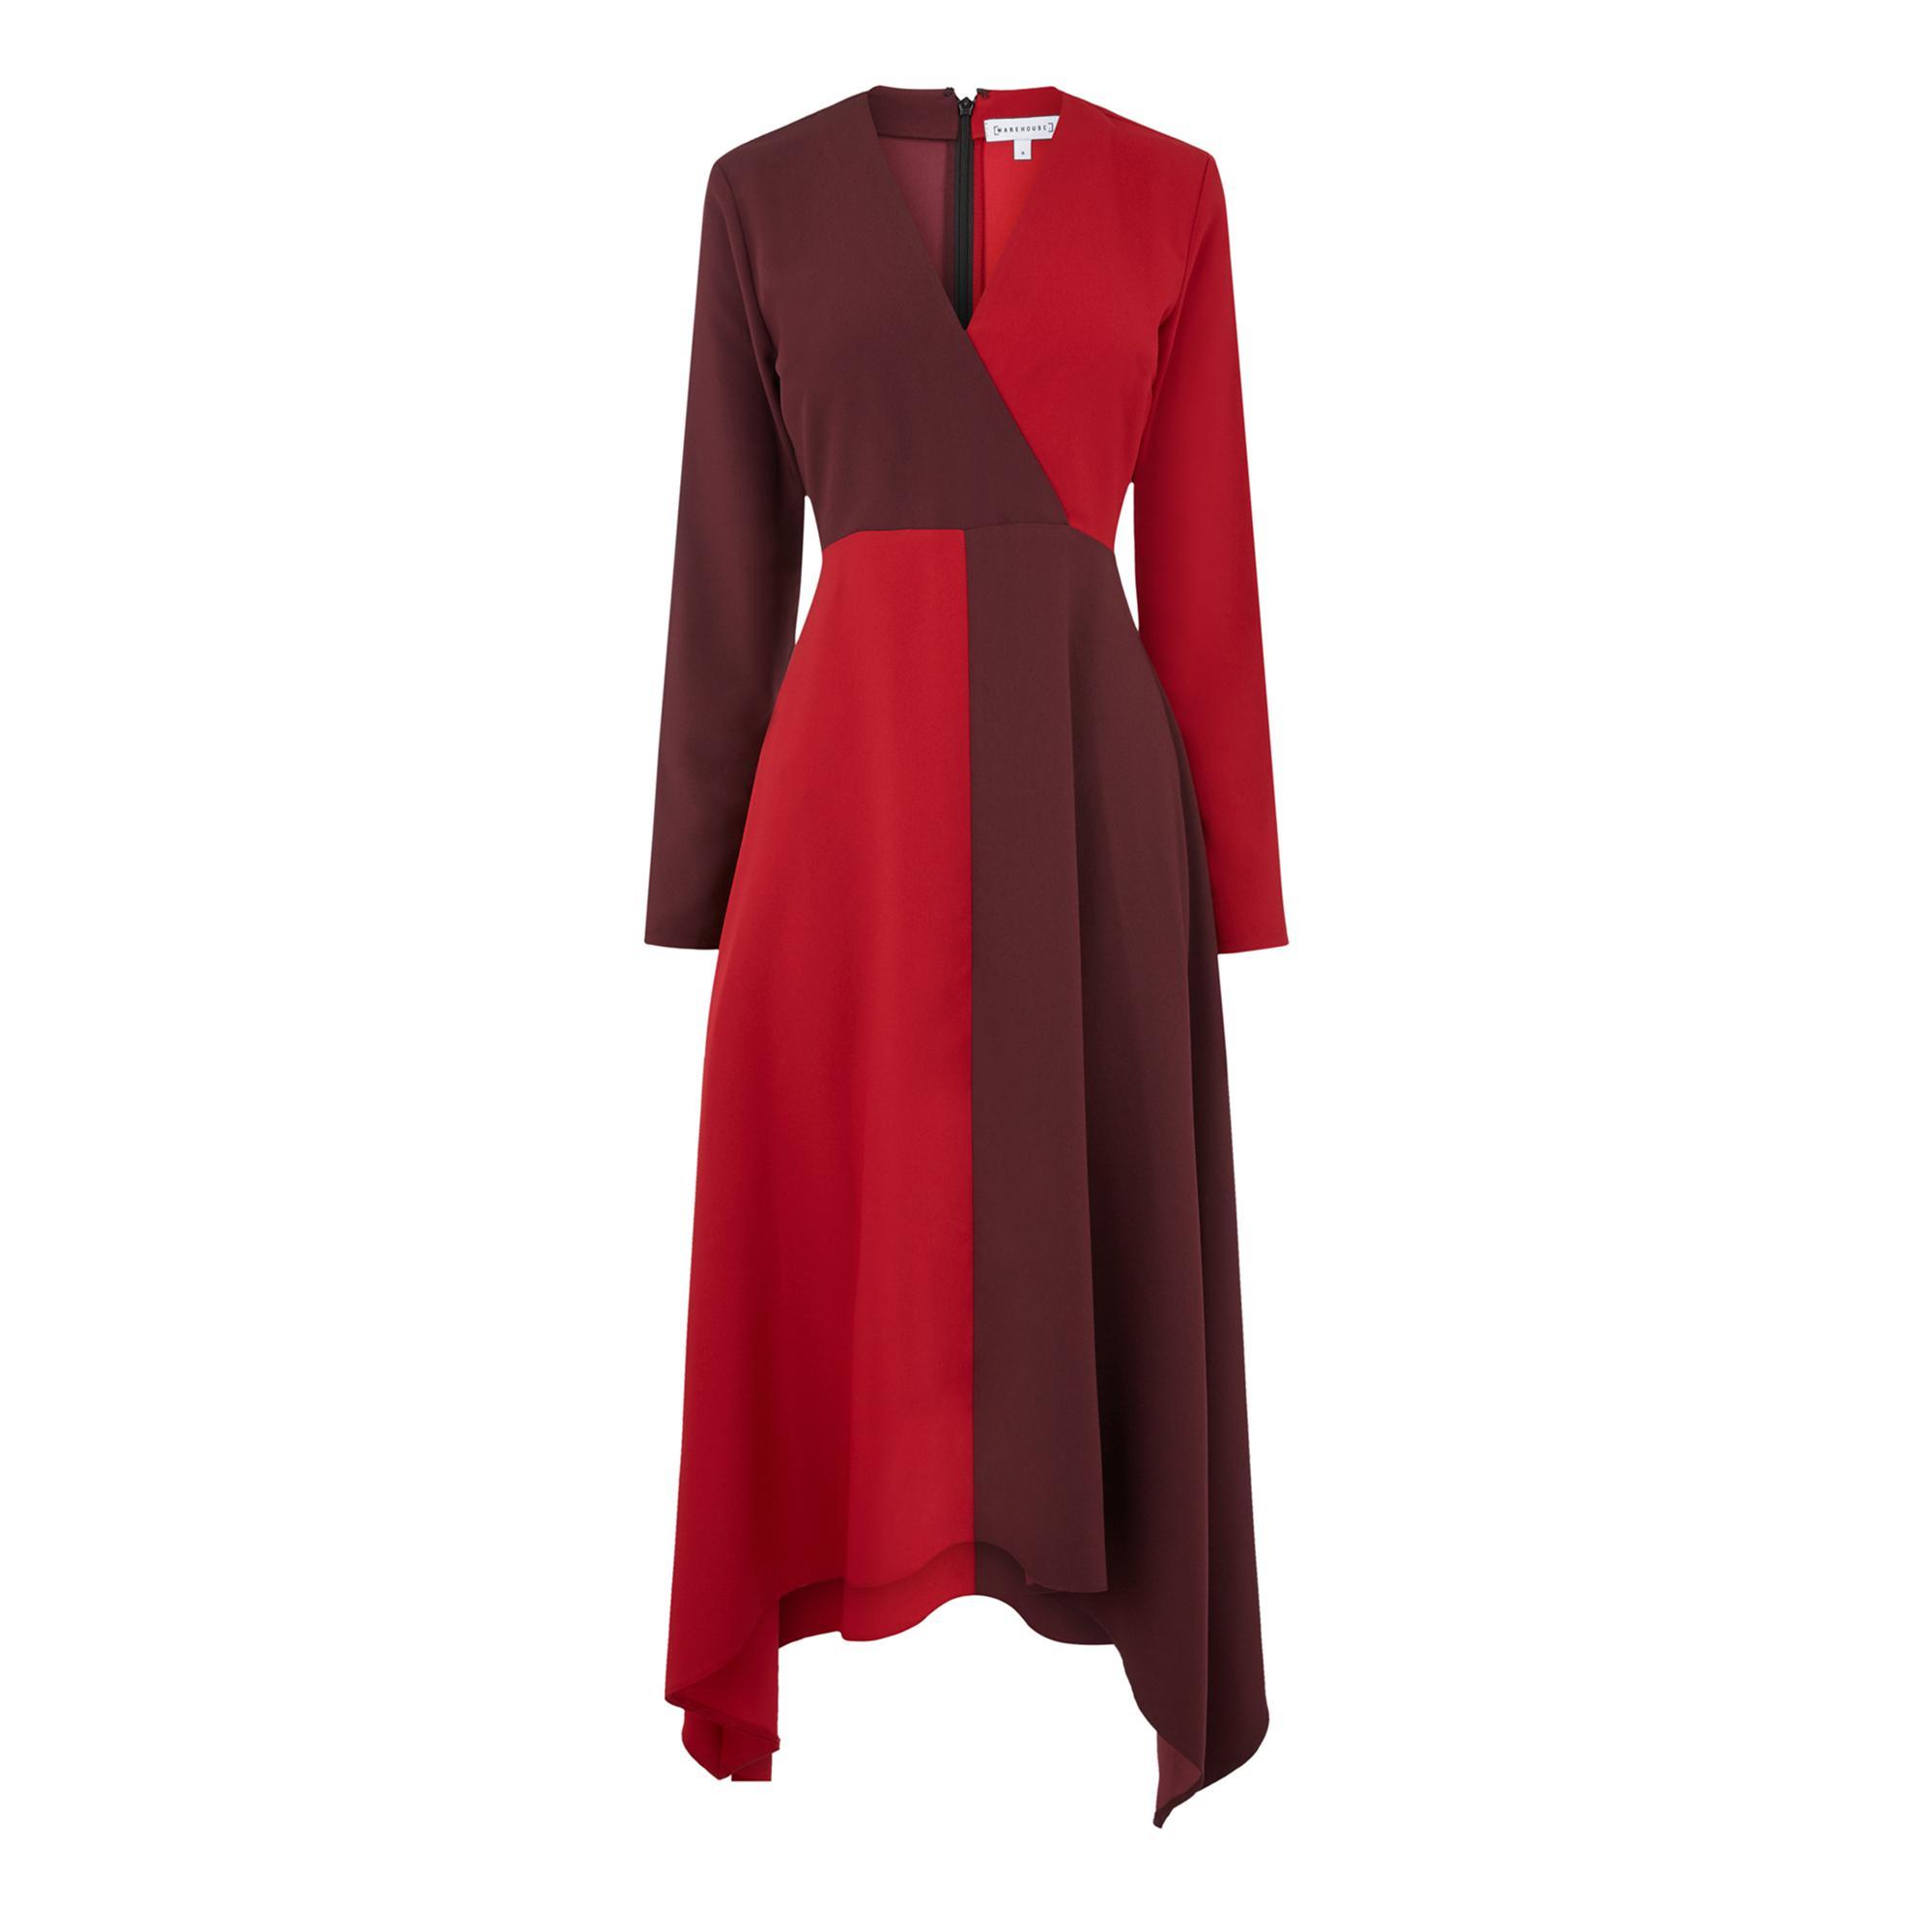 b7d946bcd6 Warehouse Ruby Colour Block Midi Dress in Red - Lyst